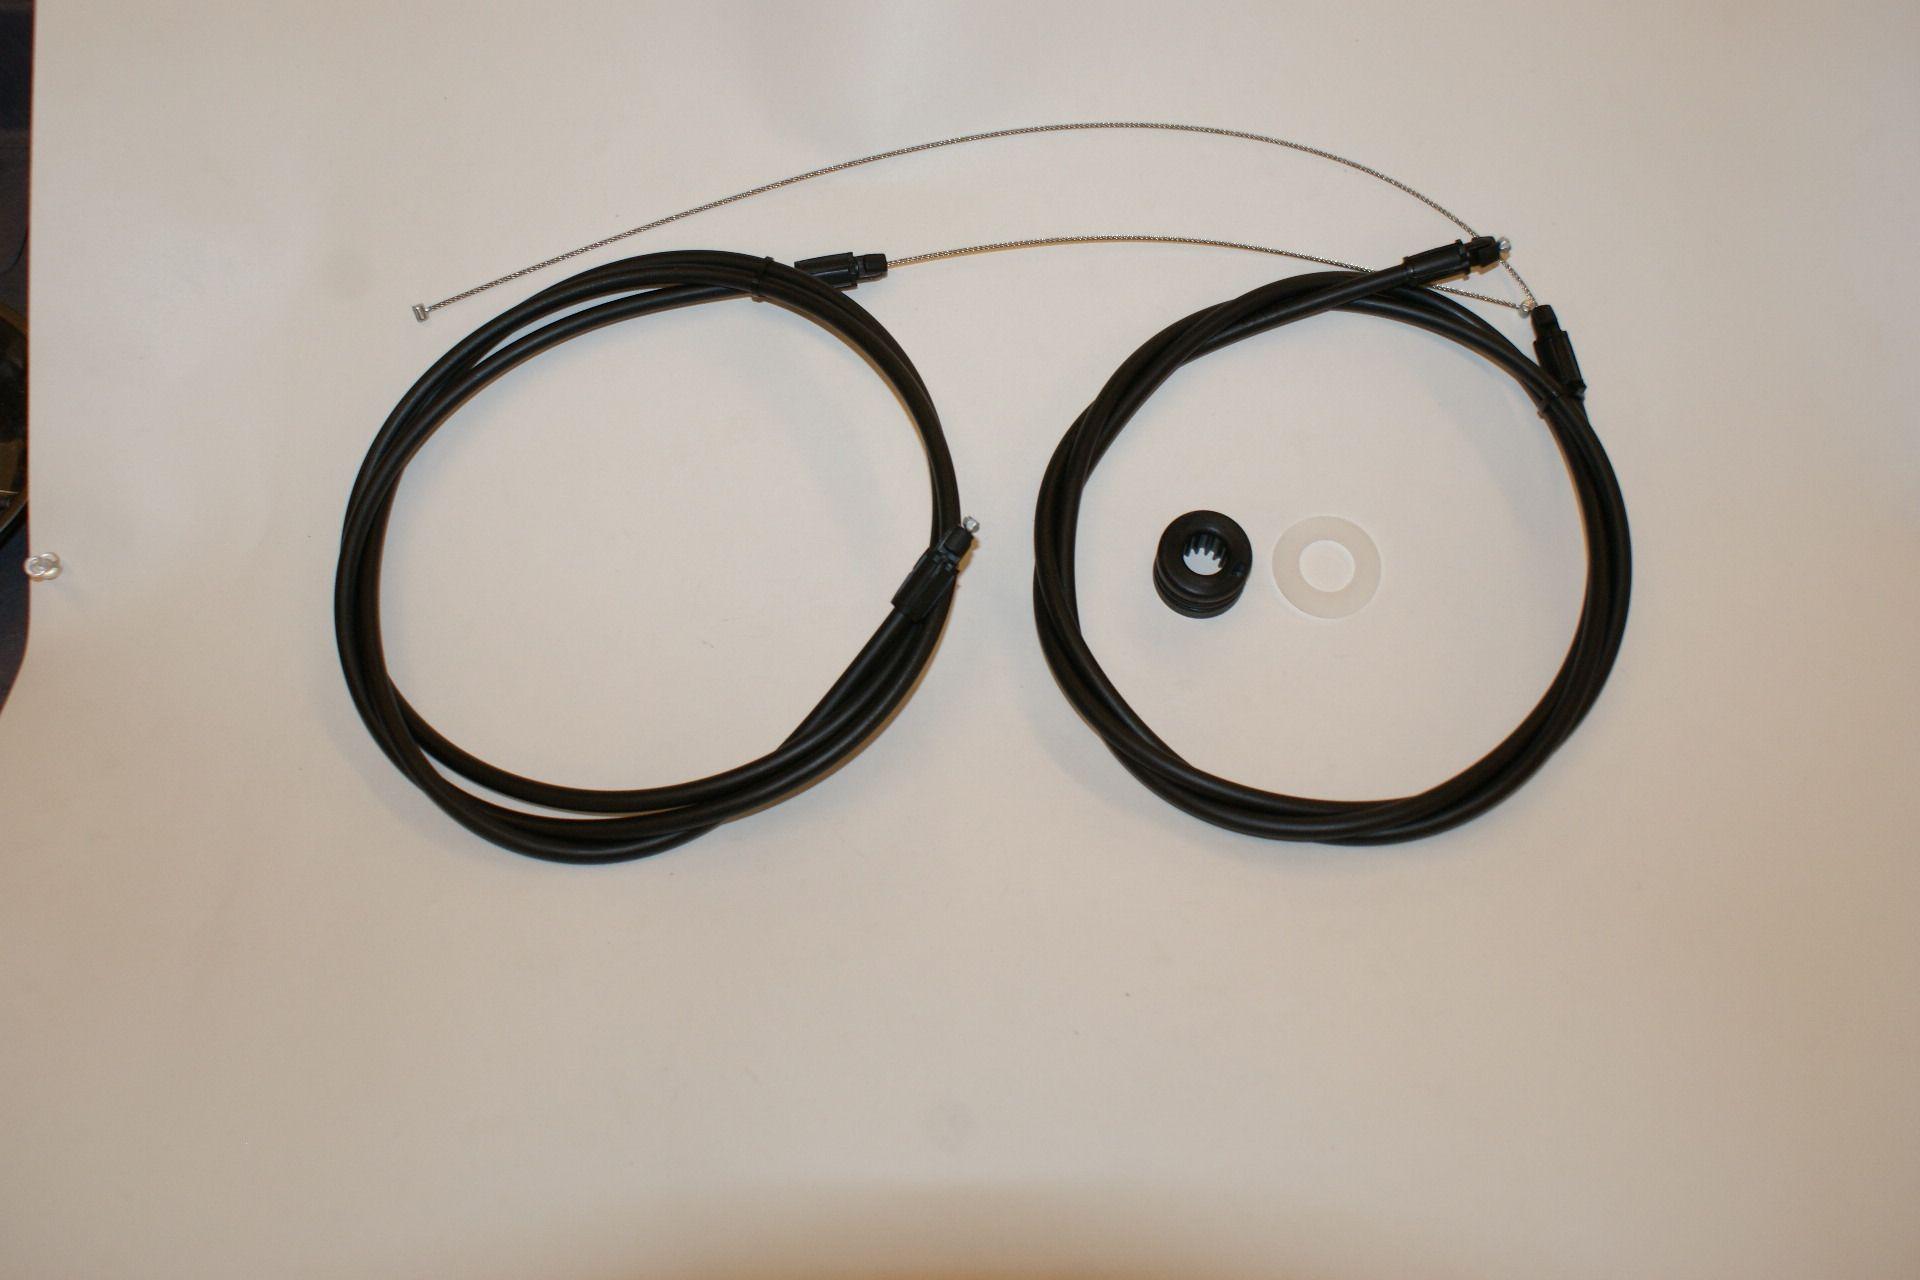 medium resolution of cable repair kit for minn kota maxxum trolling motors